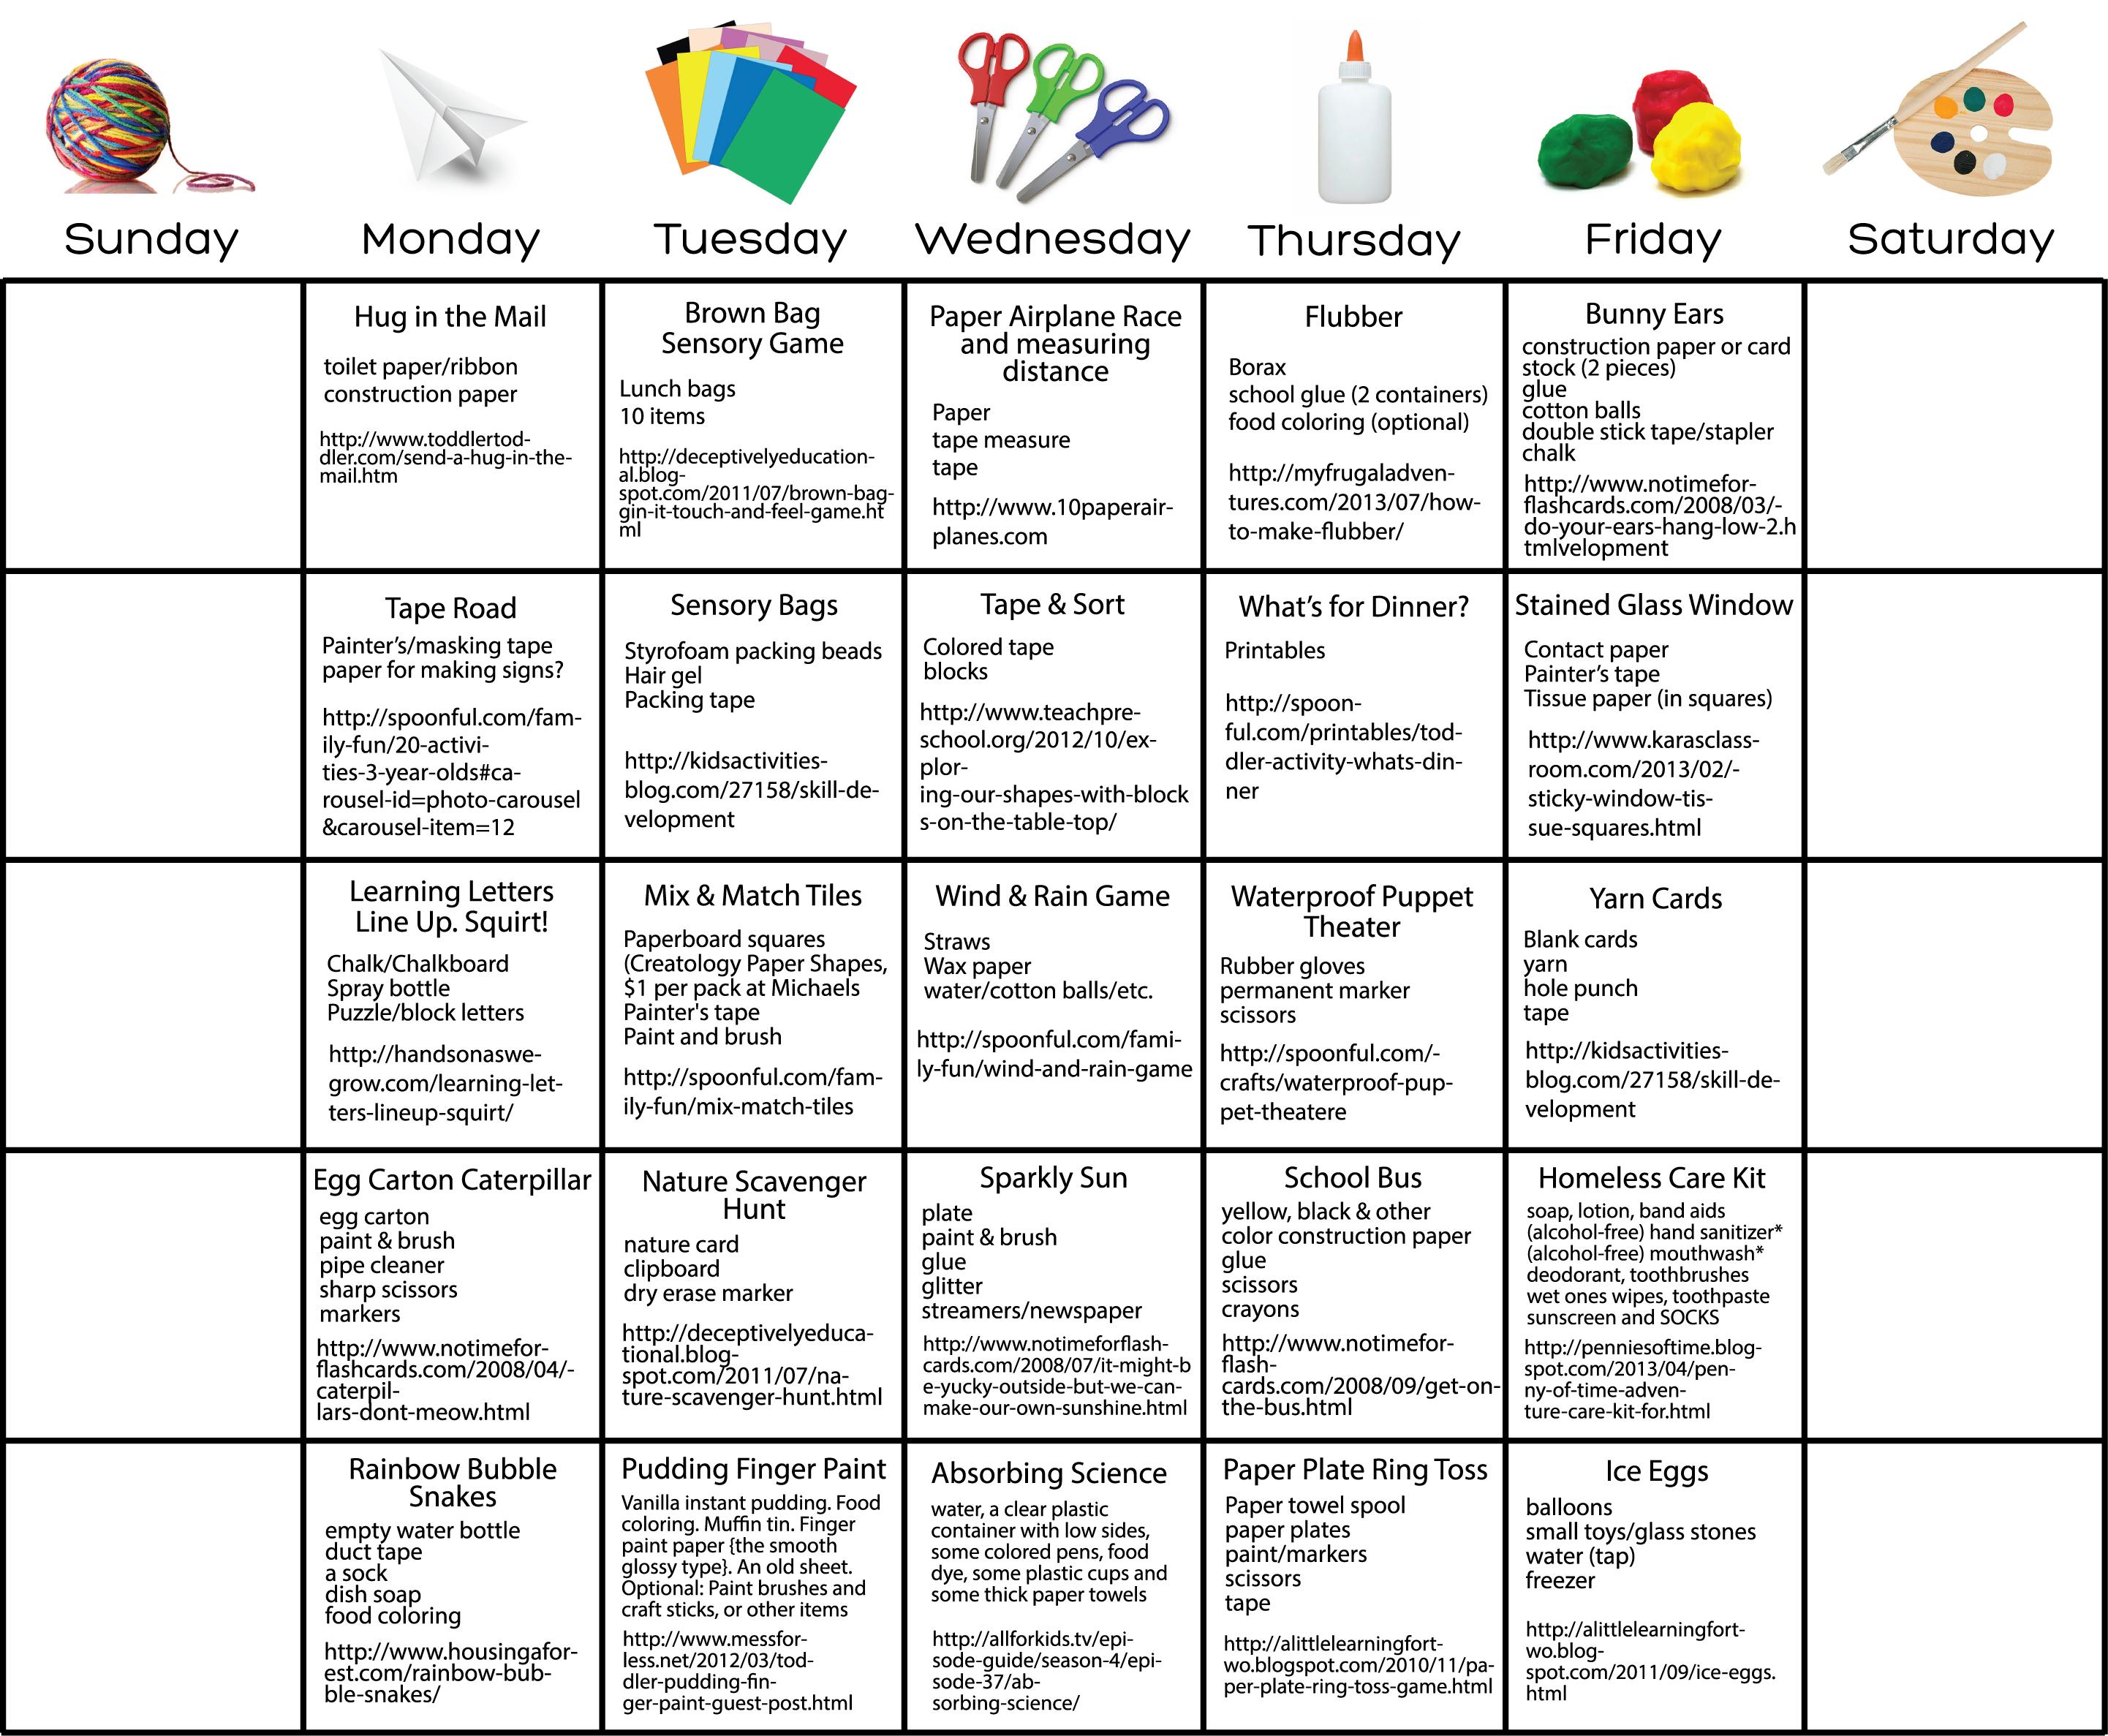 Daily Activity Calendar For Kids Toddler Early Preschool